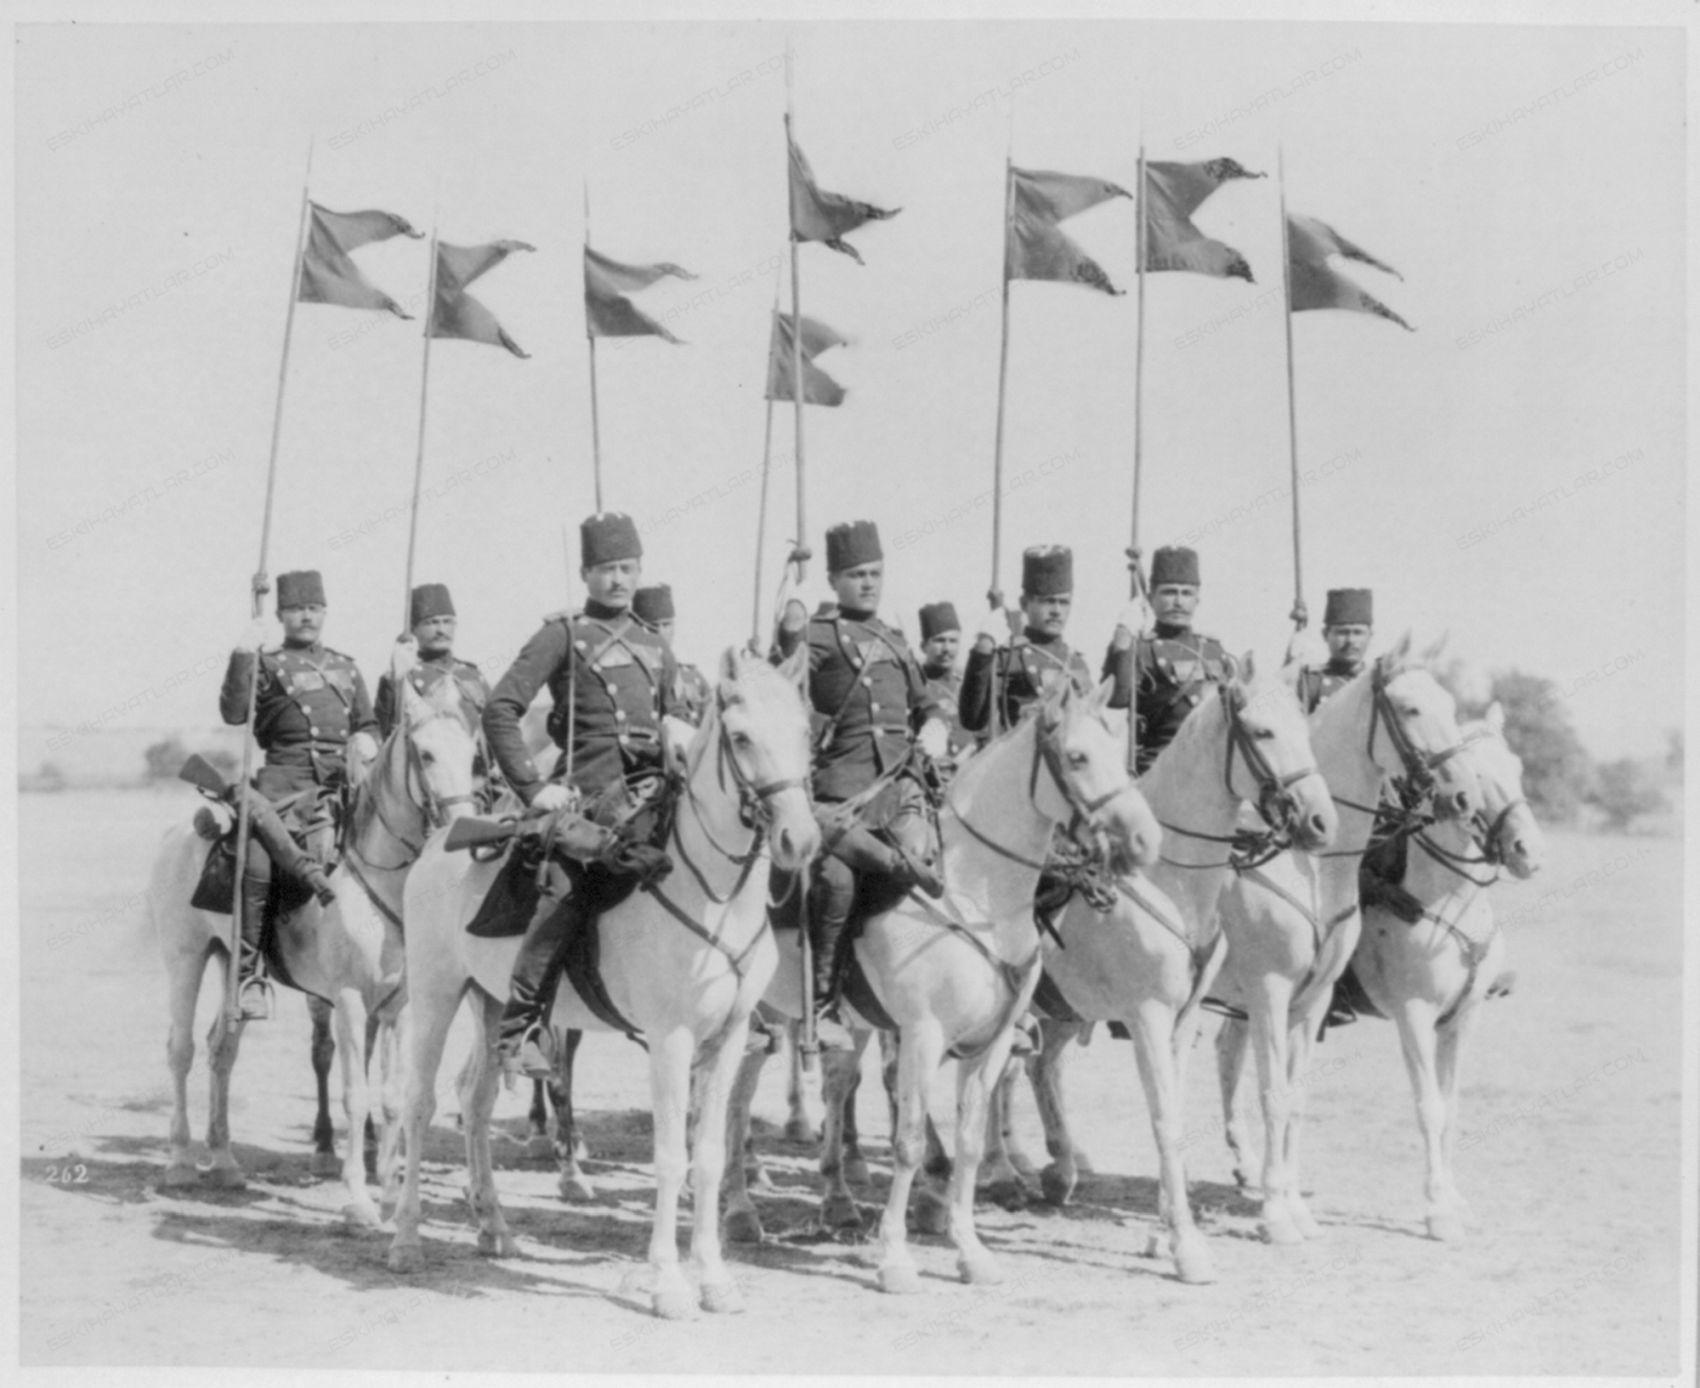 0369-sultan-abdulhamid-vefatinin-100-yili-yedi-kita-dergisi-abdulhamid-belgeseli (0)